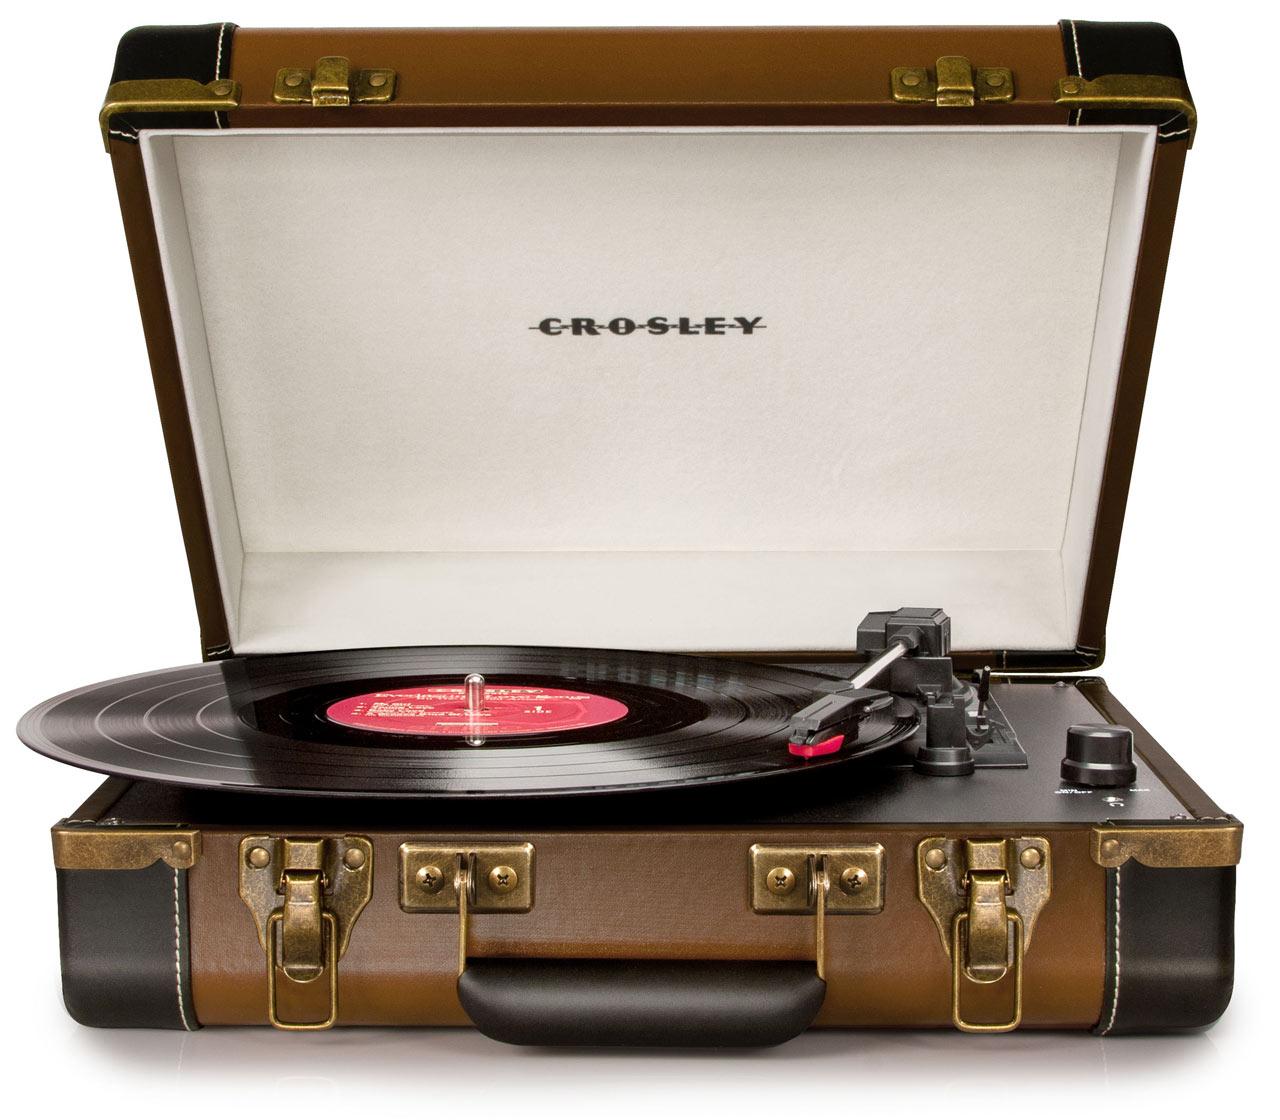 crosley-turntable-suitcase